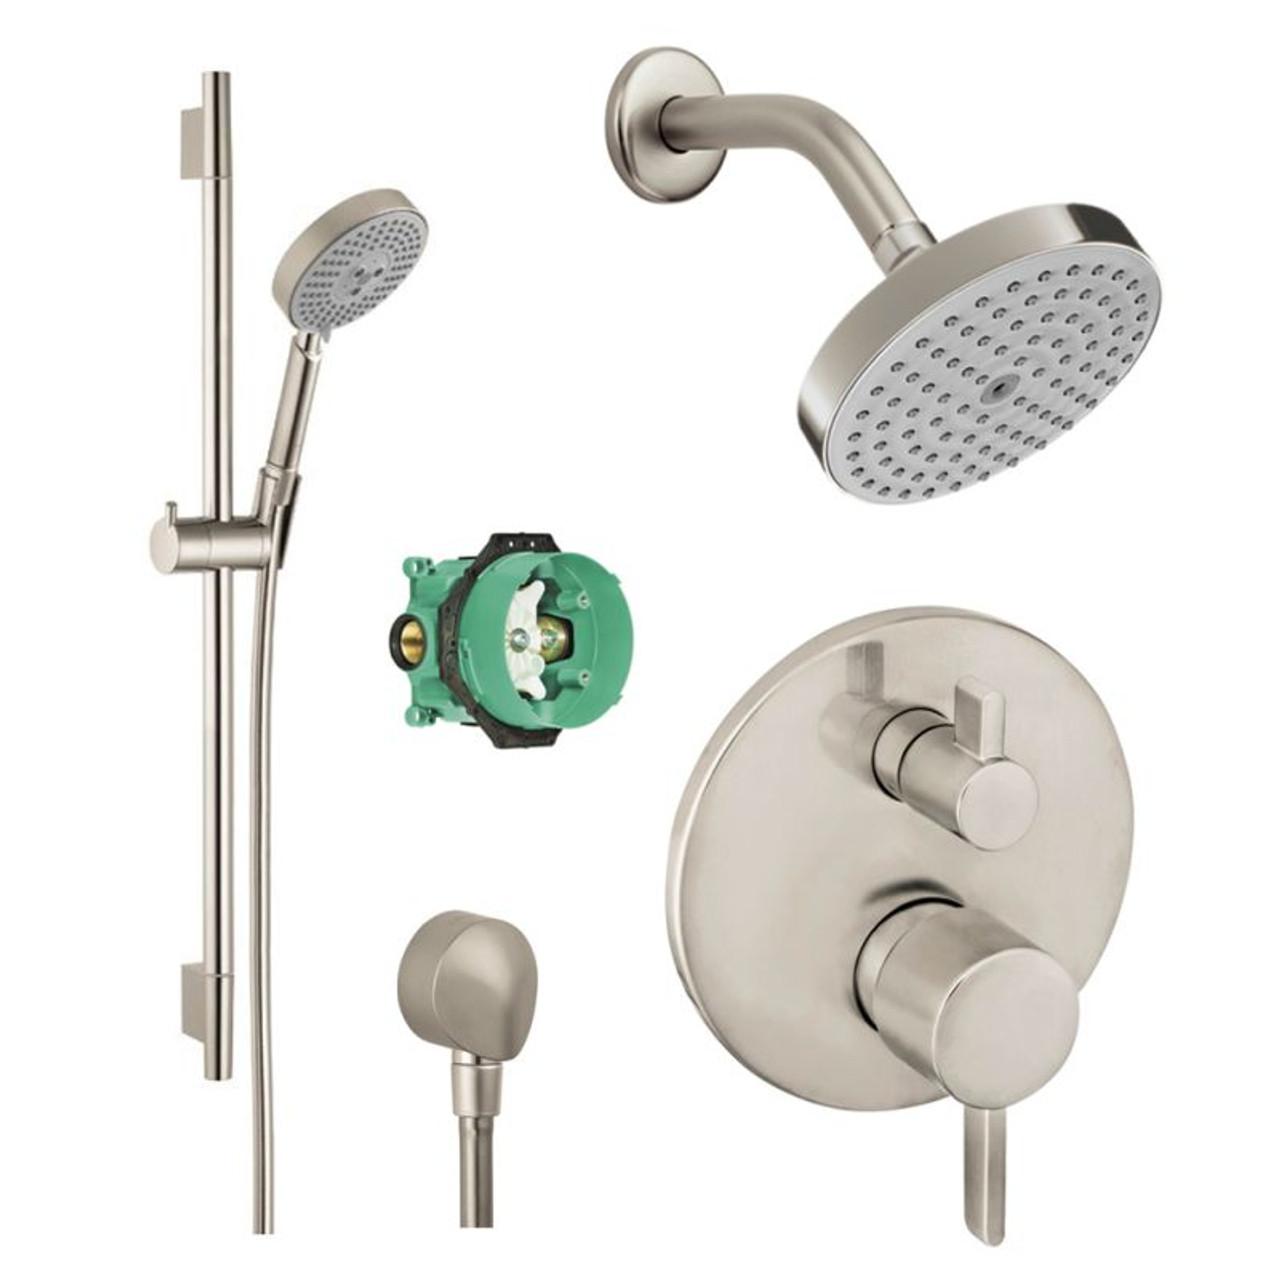 Hansgrohe Ksh04447 27486 66bn Raindance Shower Faucet Kit With Handshower Wallbar Pbv Trim Diverter And Rough In